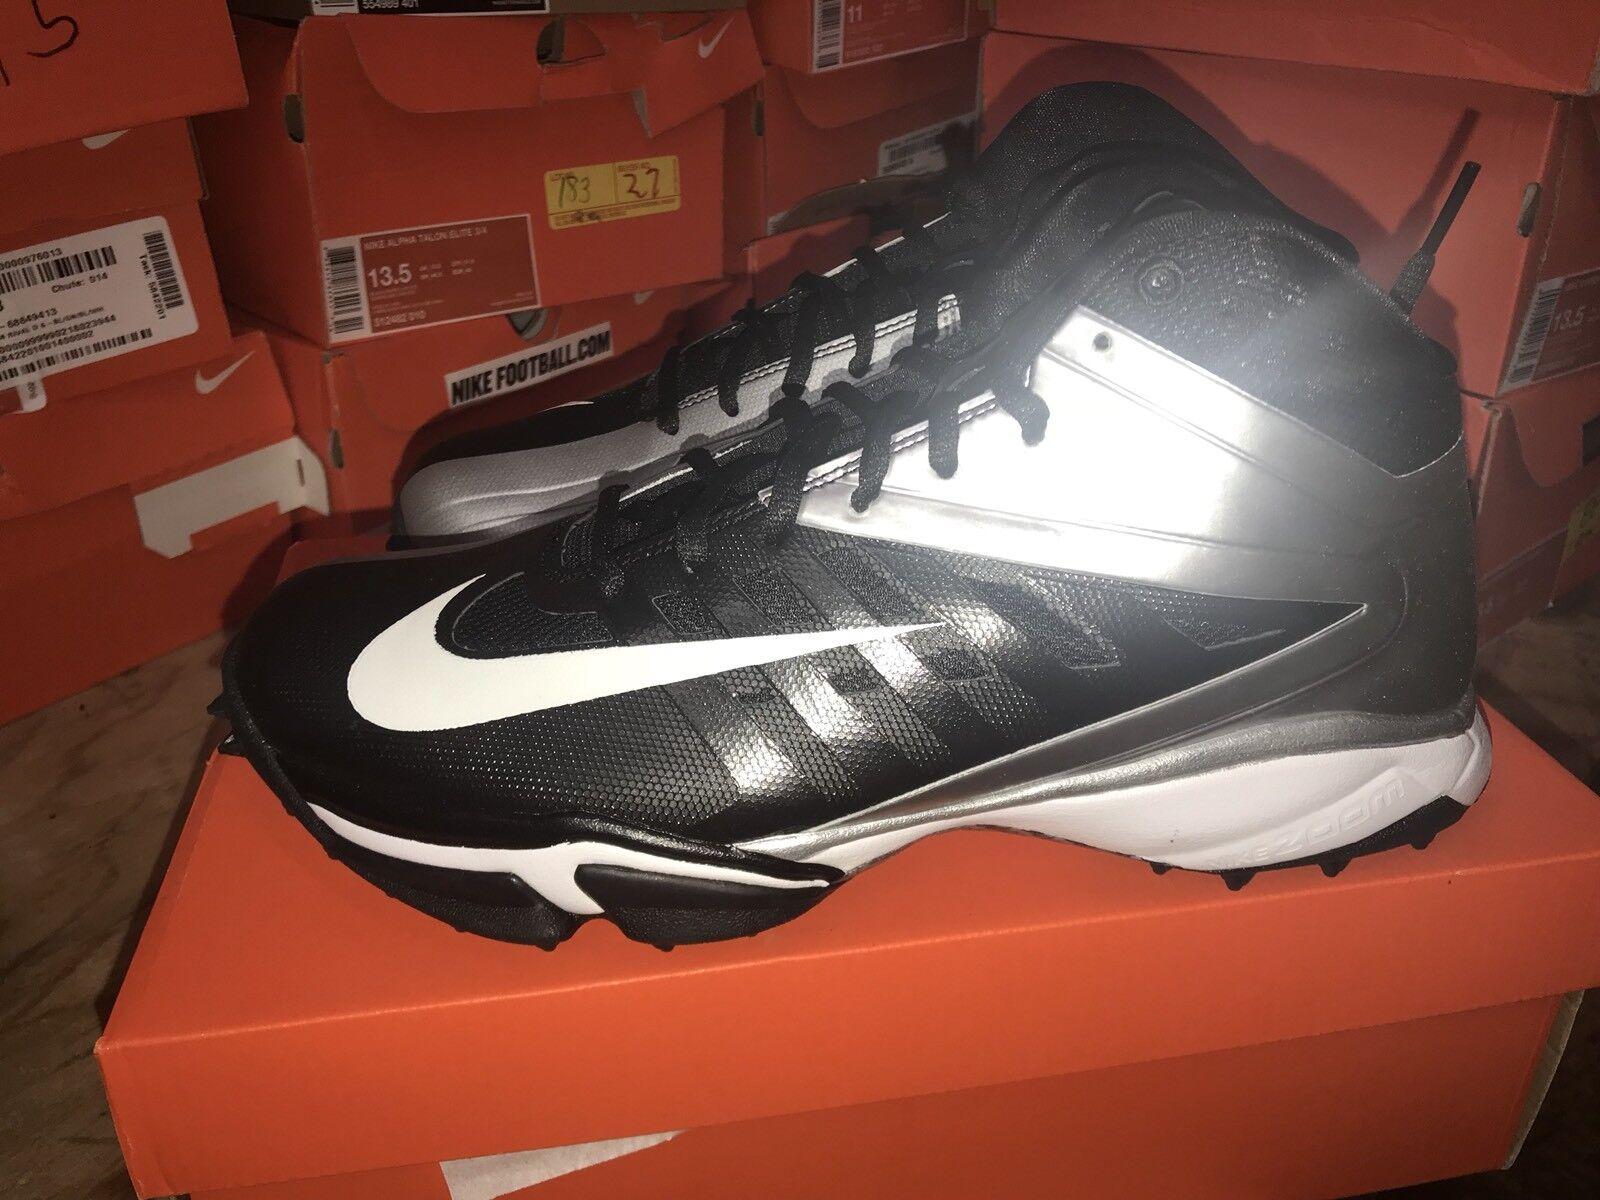 DS Nike Vapor Pro 3/4 Destroyer Mens Black Silver Training Shoes Size 9.5